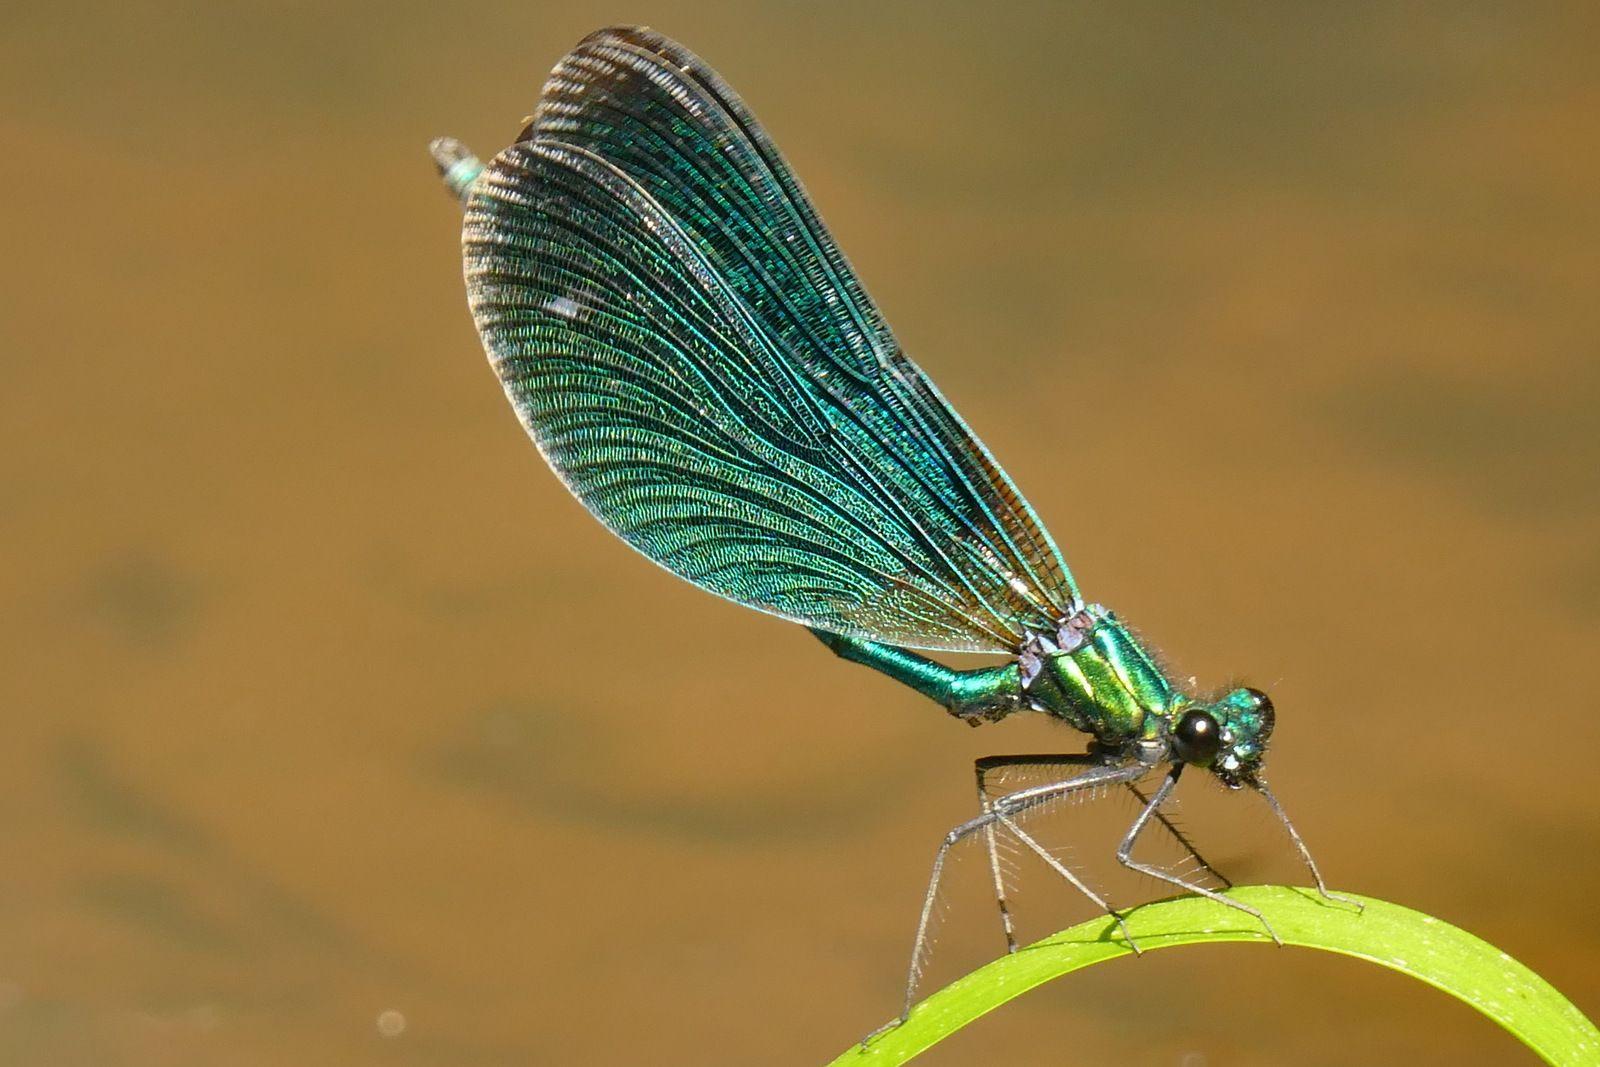 Calopteryx vierge, Crozon. Photographie lavieb-aile 28-30 mai 2020.